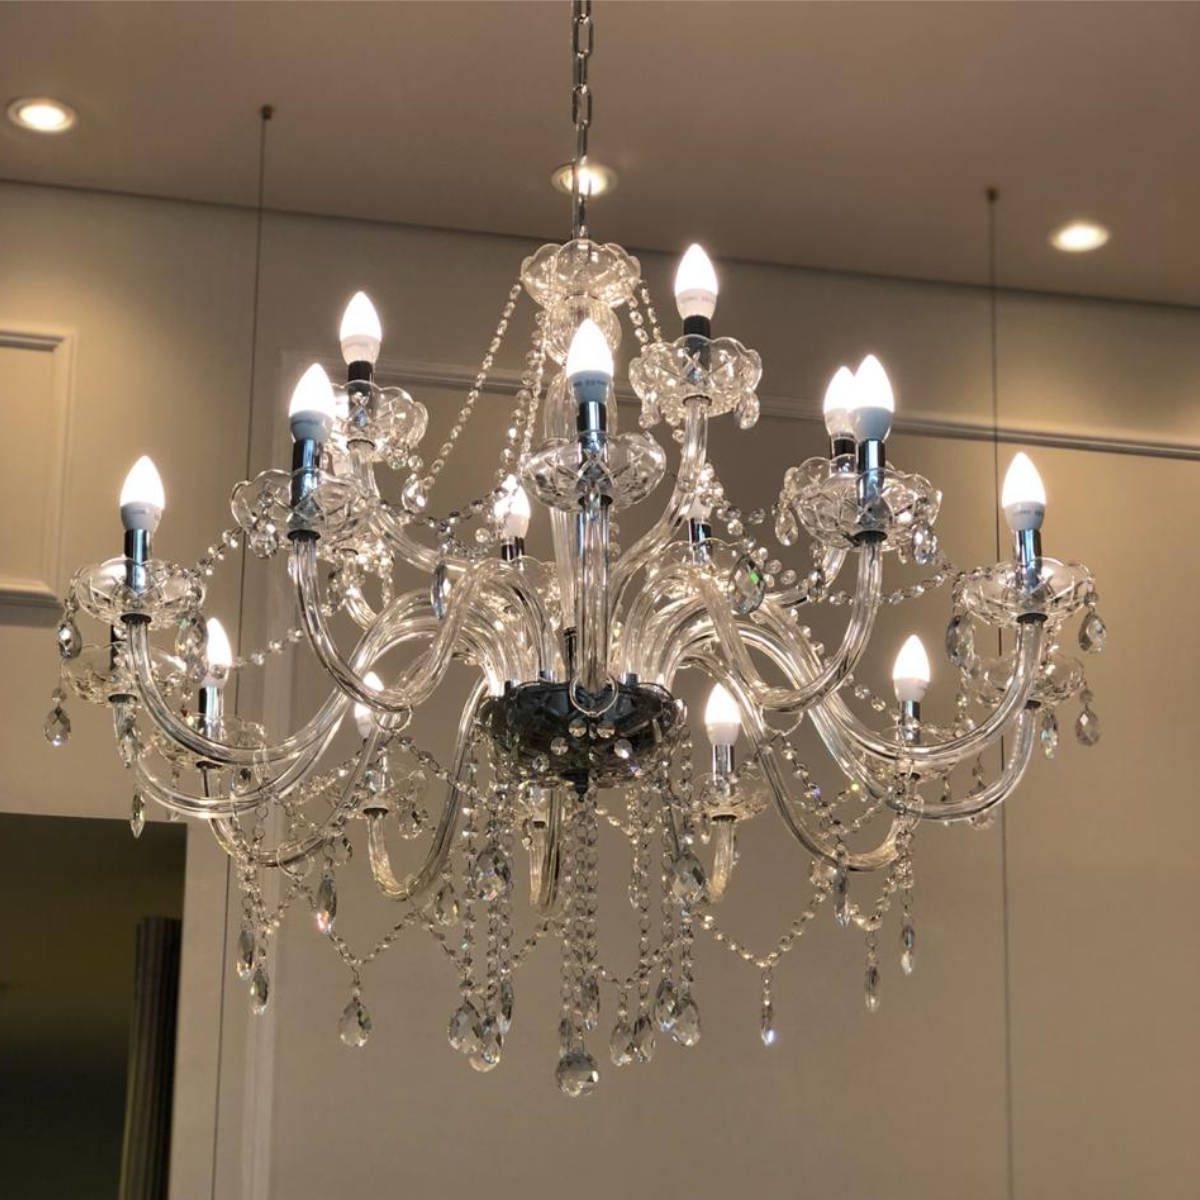 Lustre Candelabro de Cristal Maria Tereza - 18 Braços Transparente